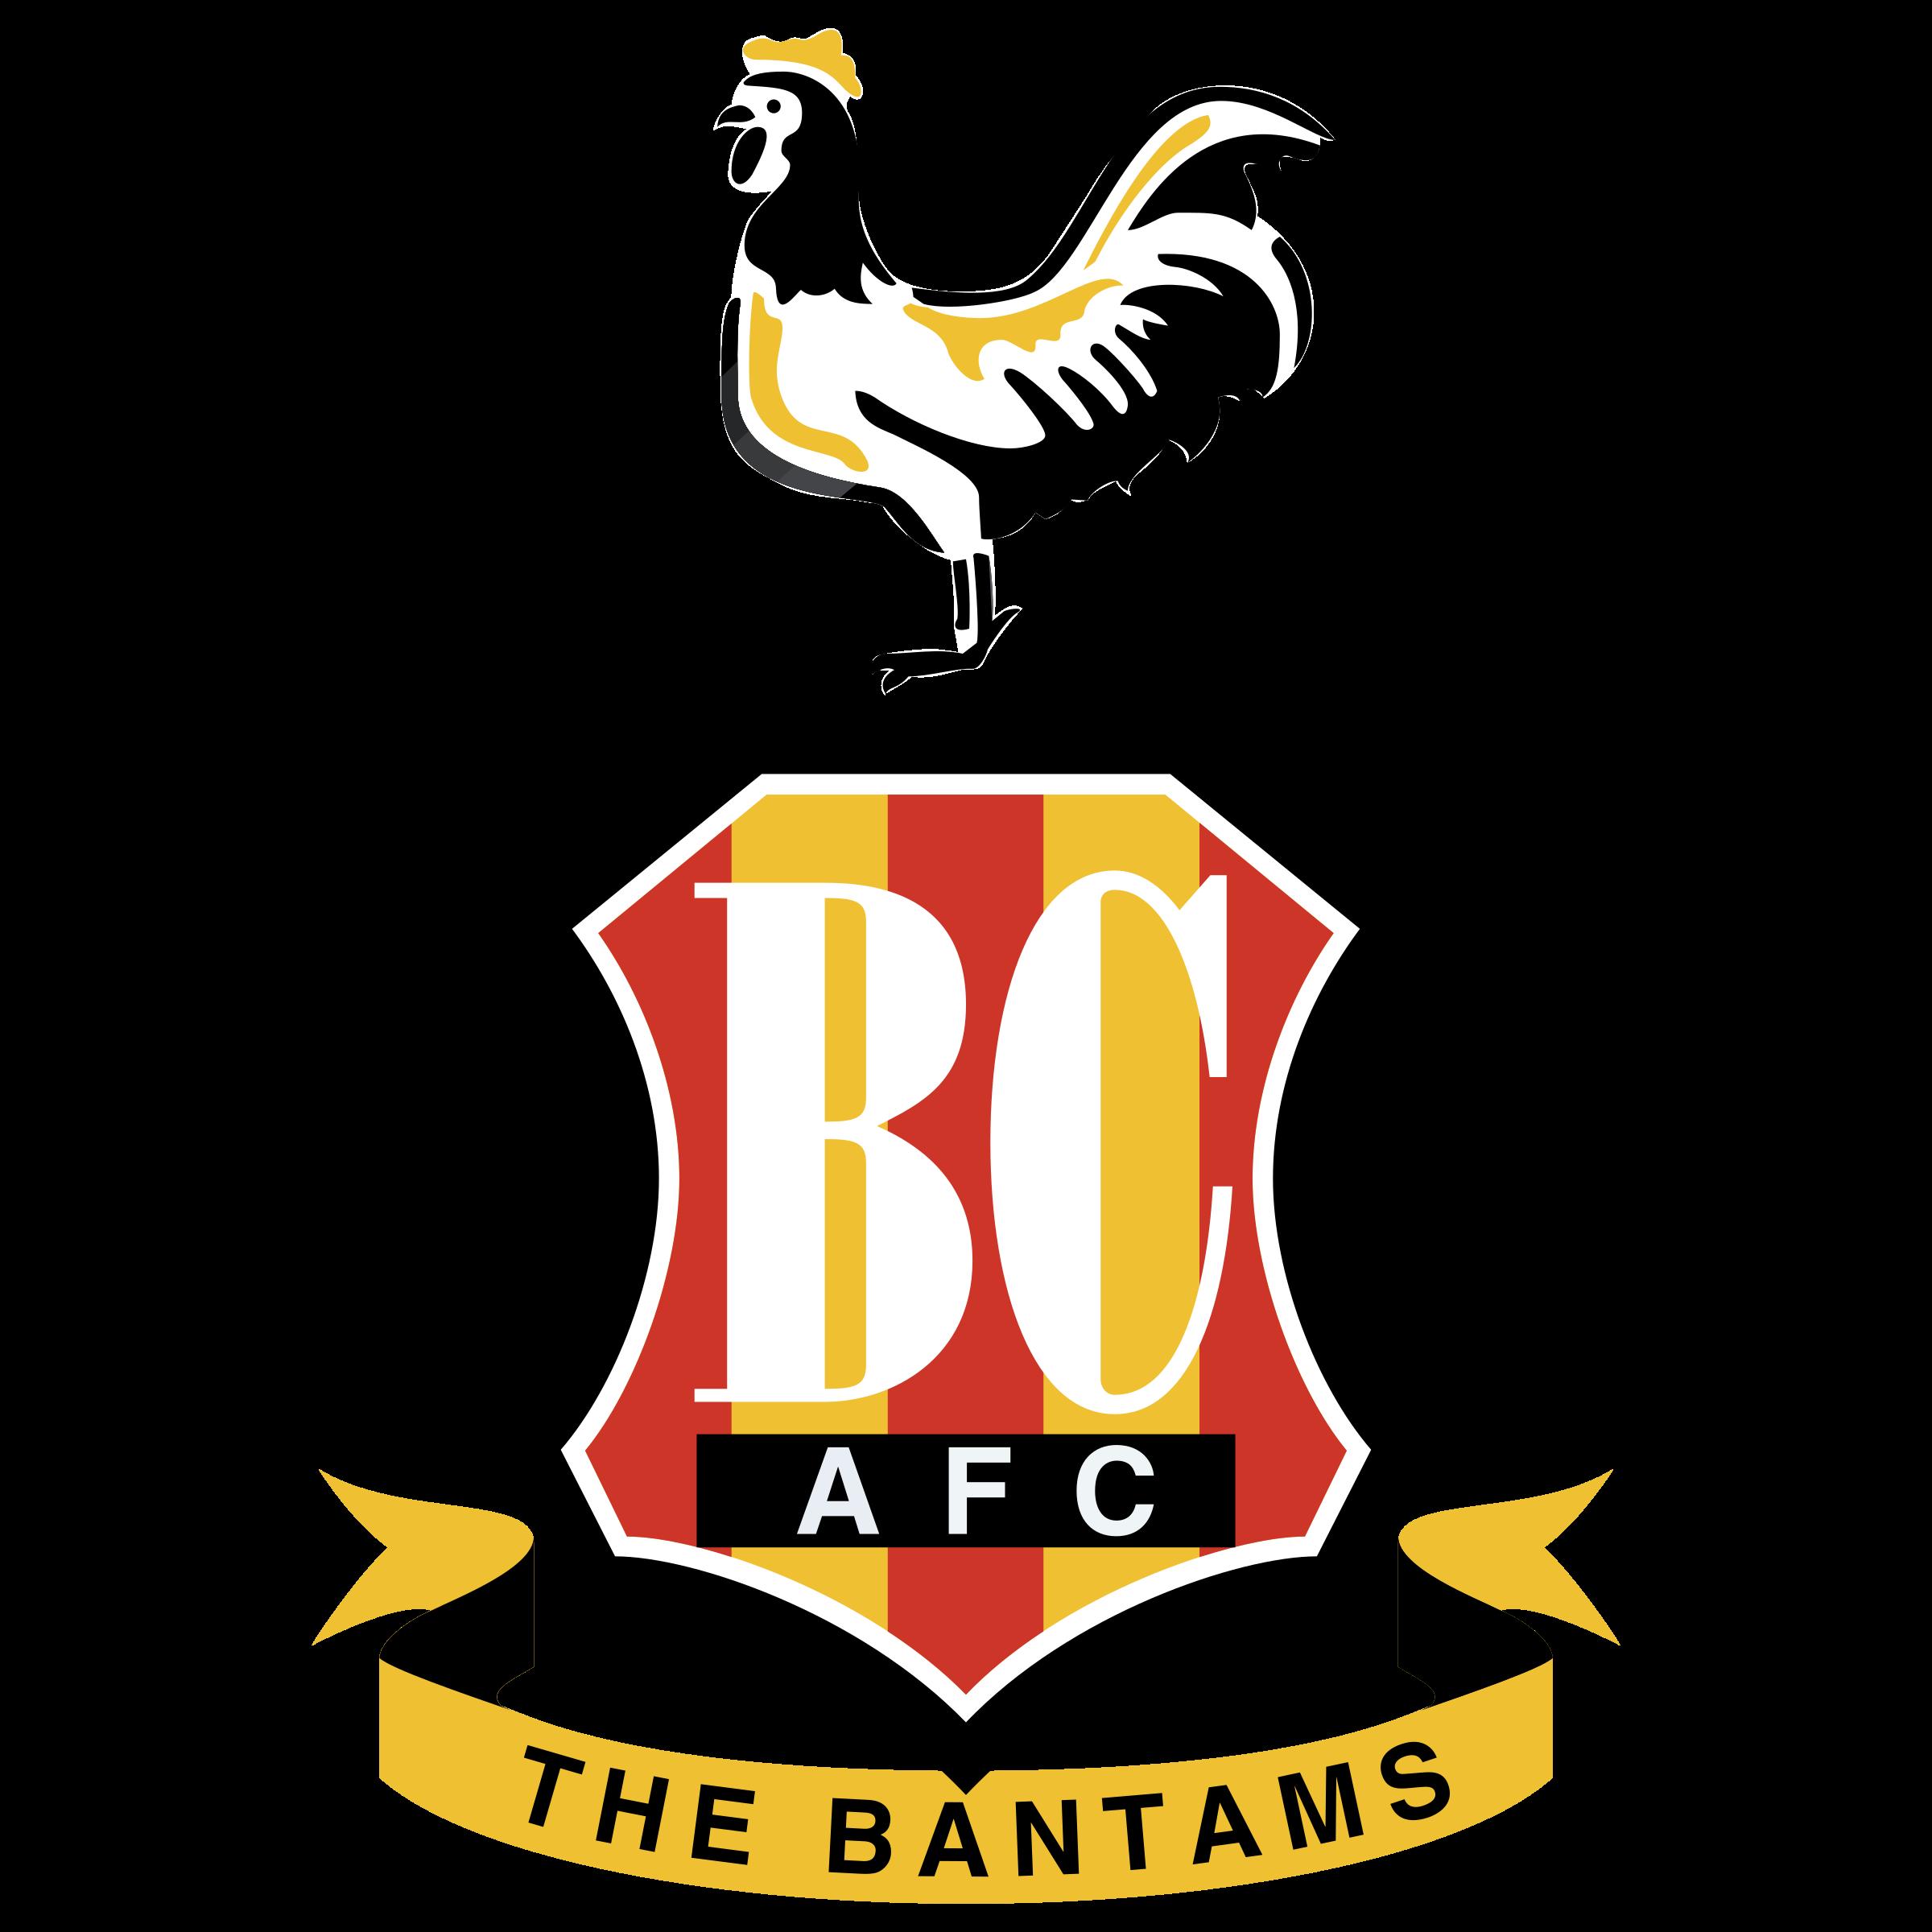 Bradford City AFC Logo PNG Transparent & SVG Vector ...